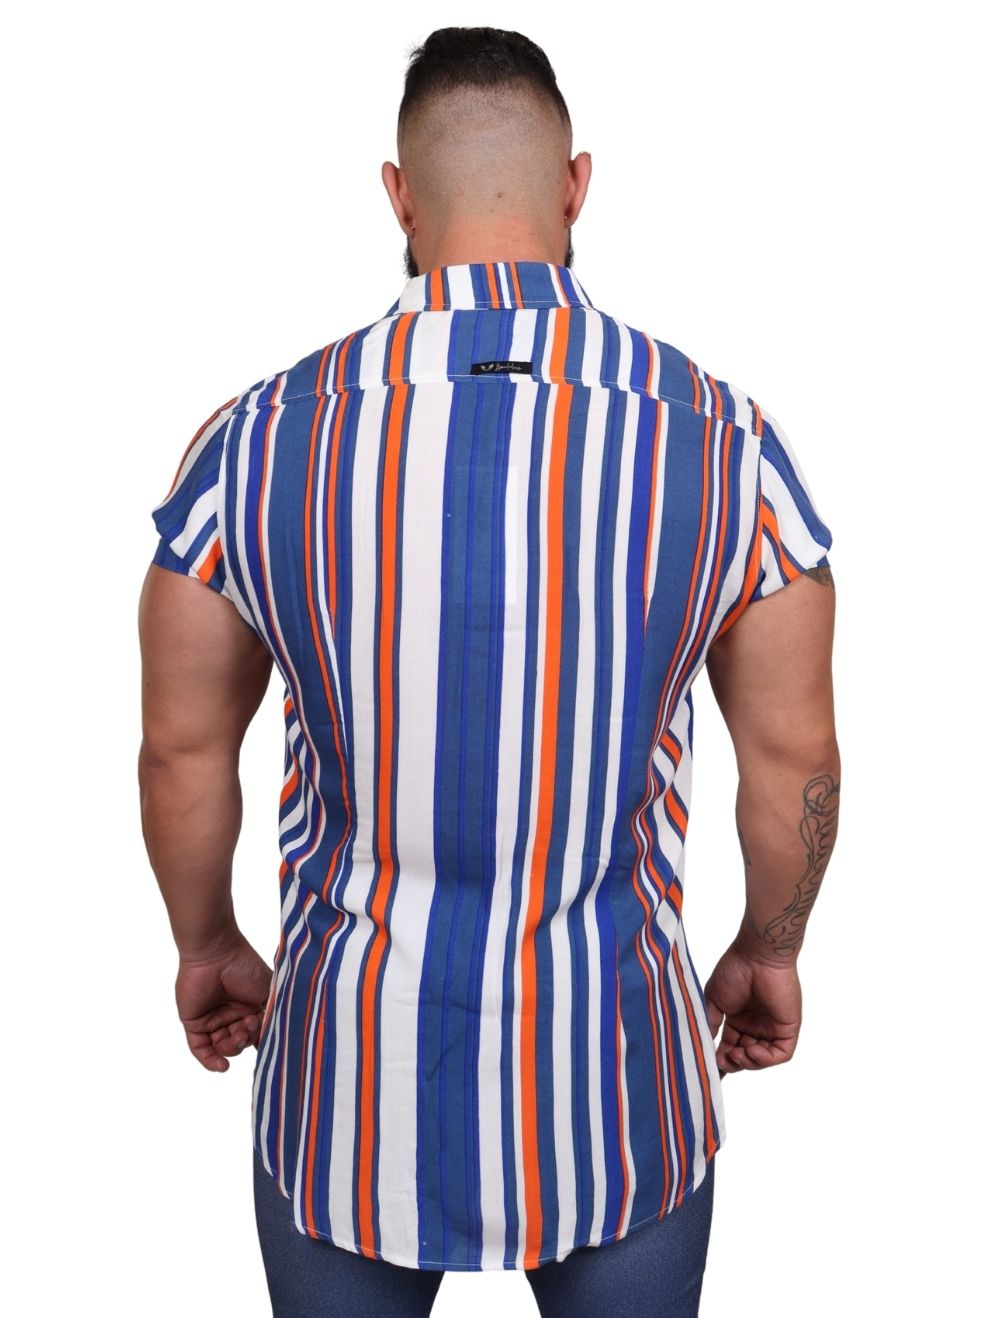 Camisa Masculina Slim Manga Curta Listrada Azul